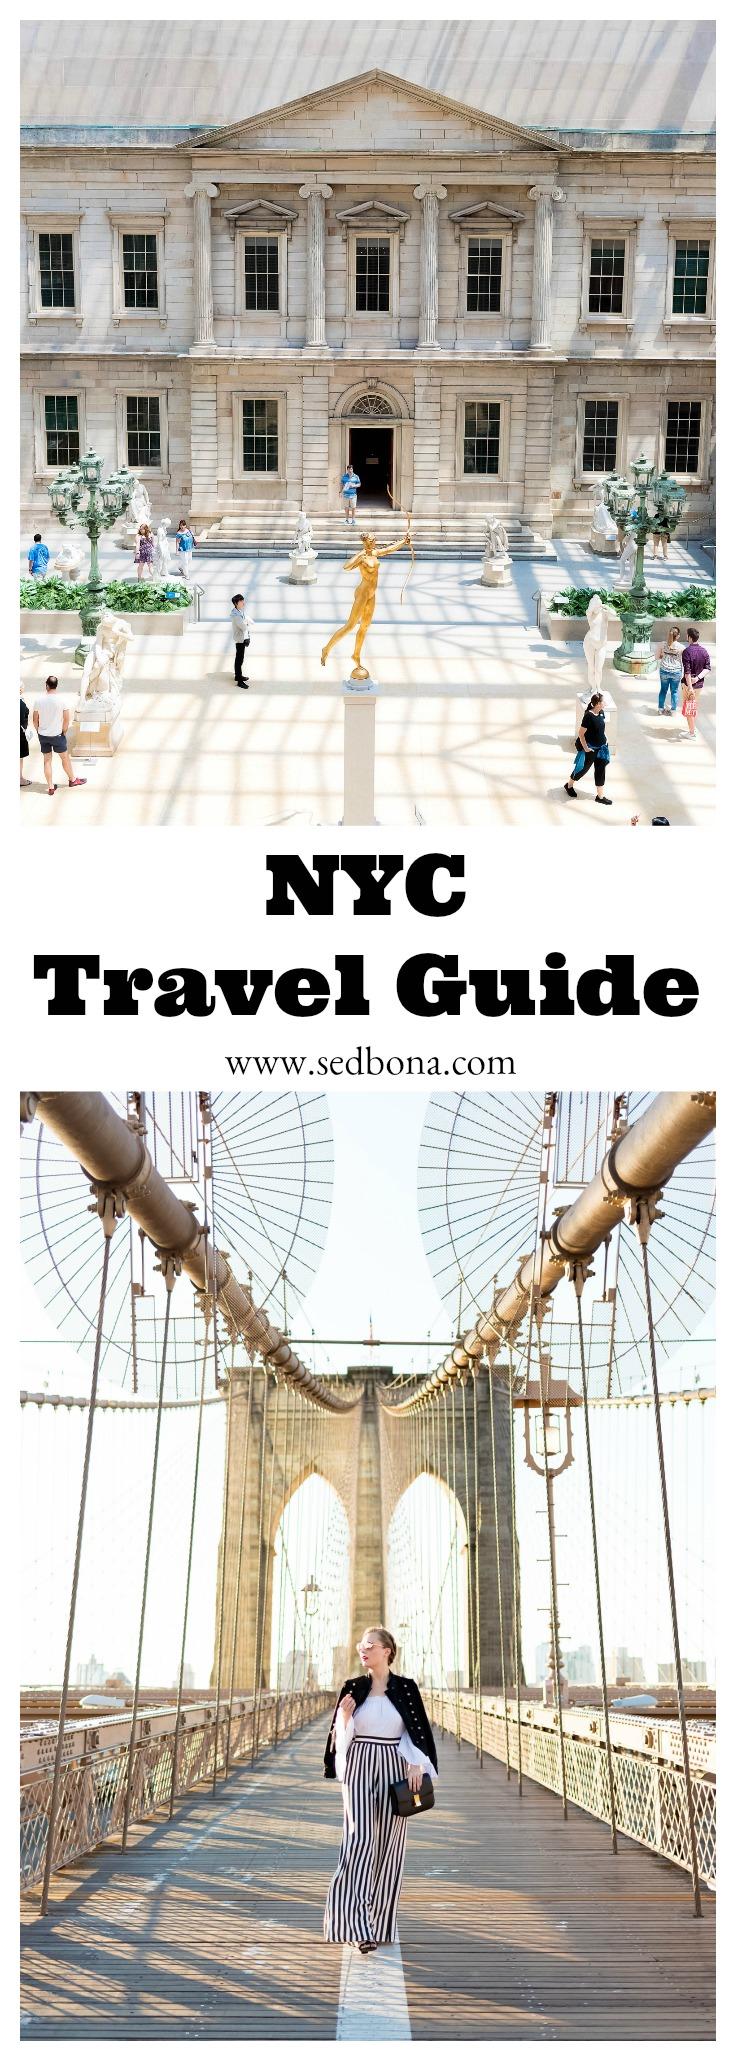 NYC Travel Guide Sed Bona